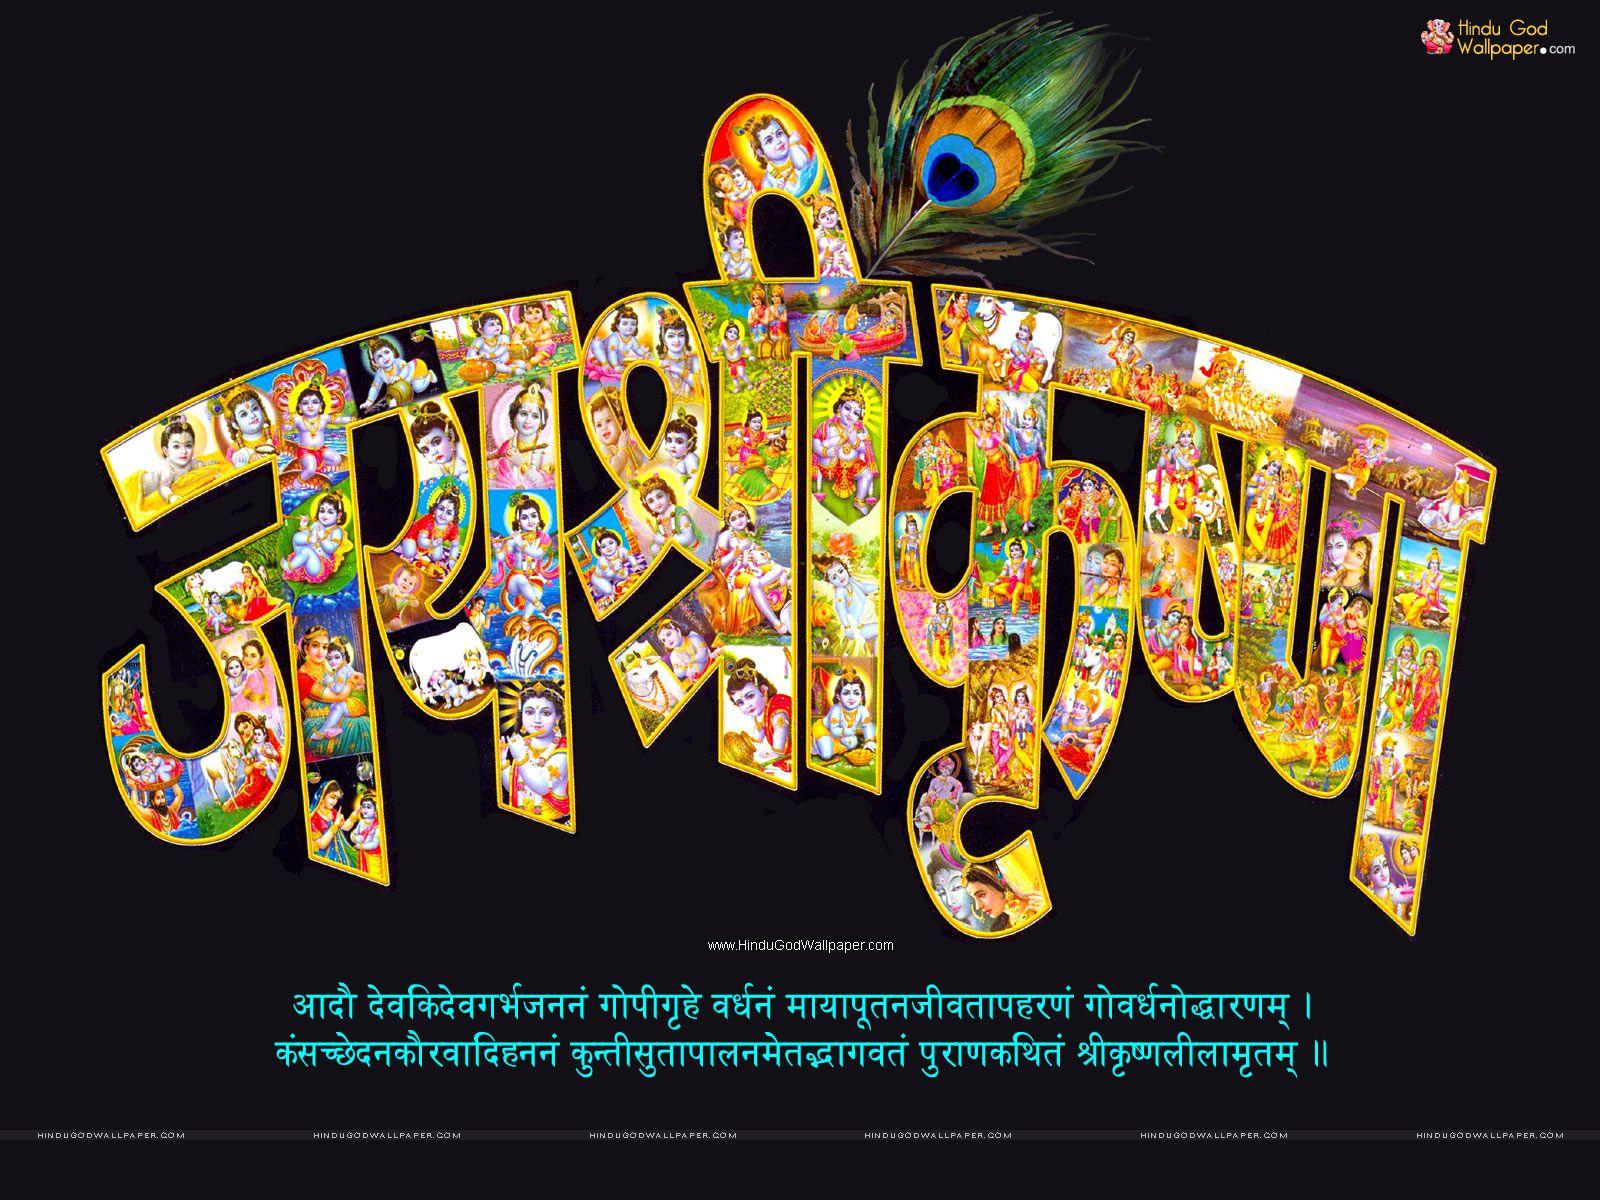 Shri Krishna Janmashtami Hd Wallpapers Download Krishna Janmashtami Janmashtami Wallpapers Shree Krishna